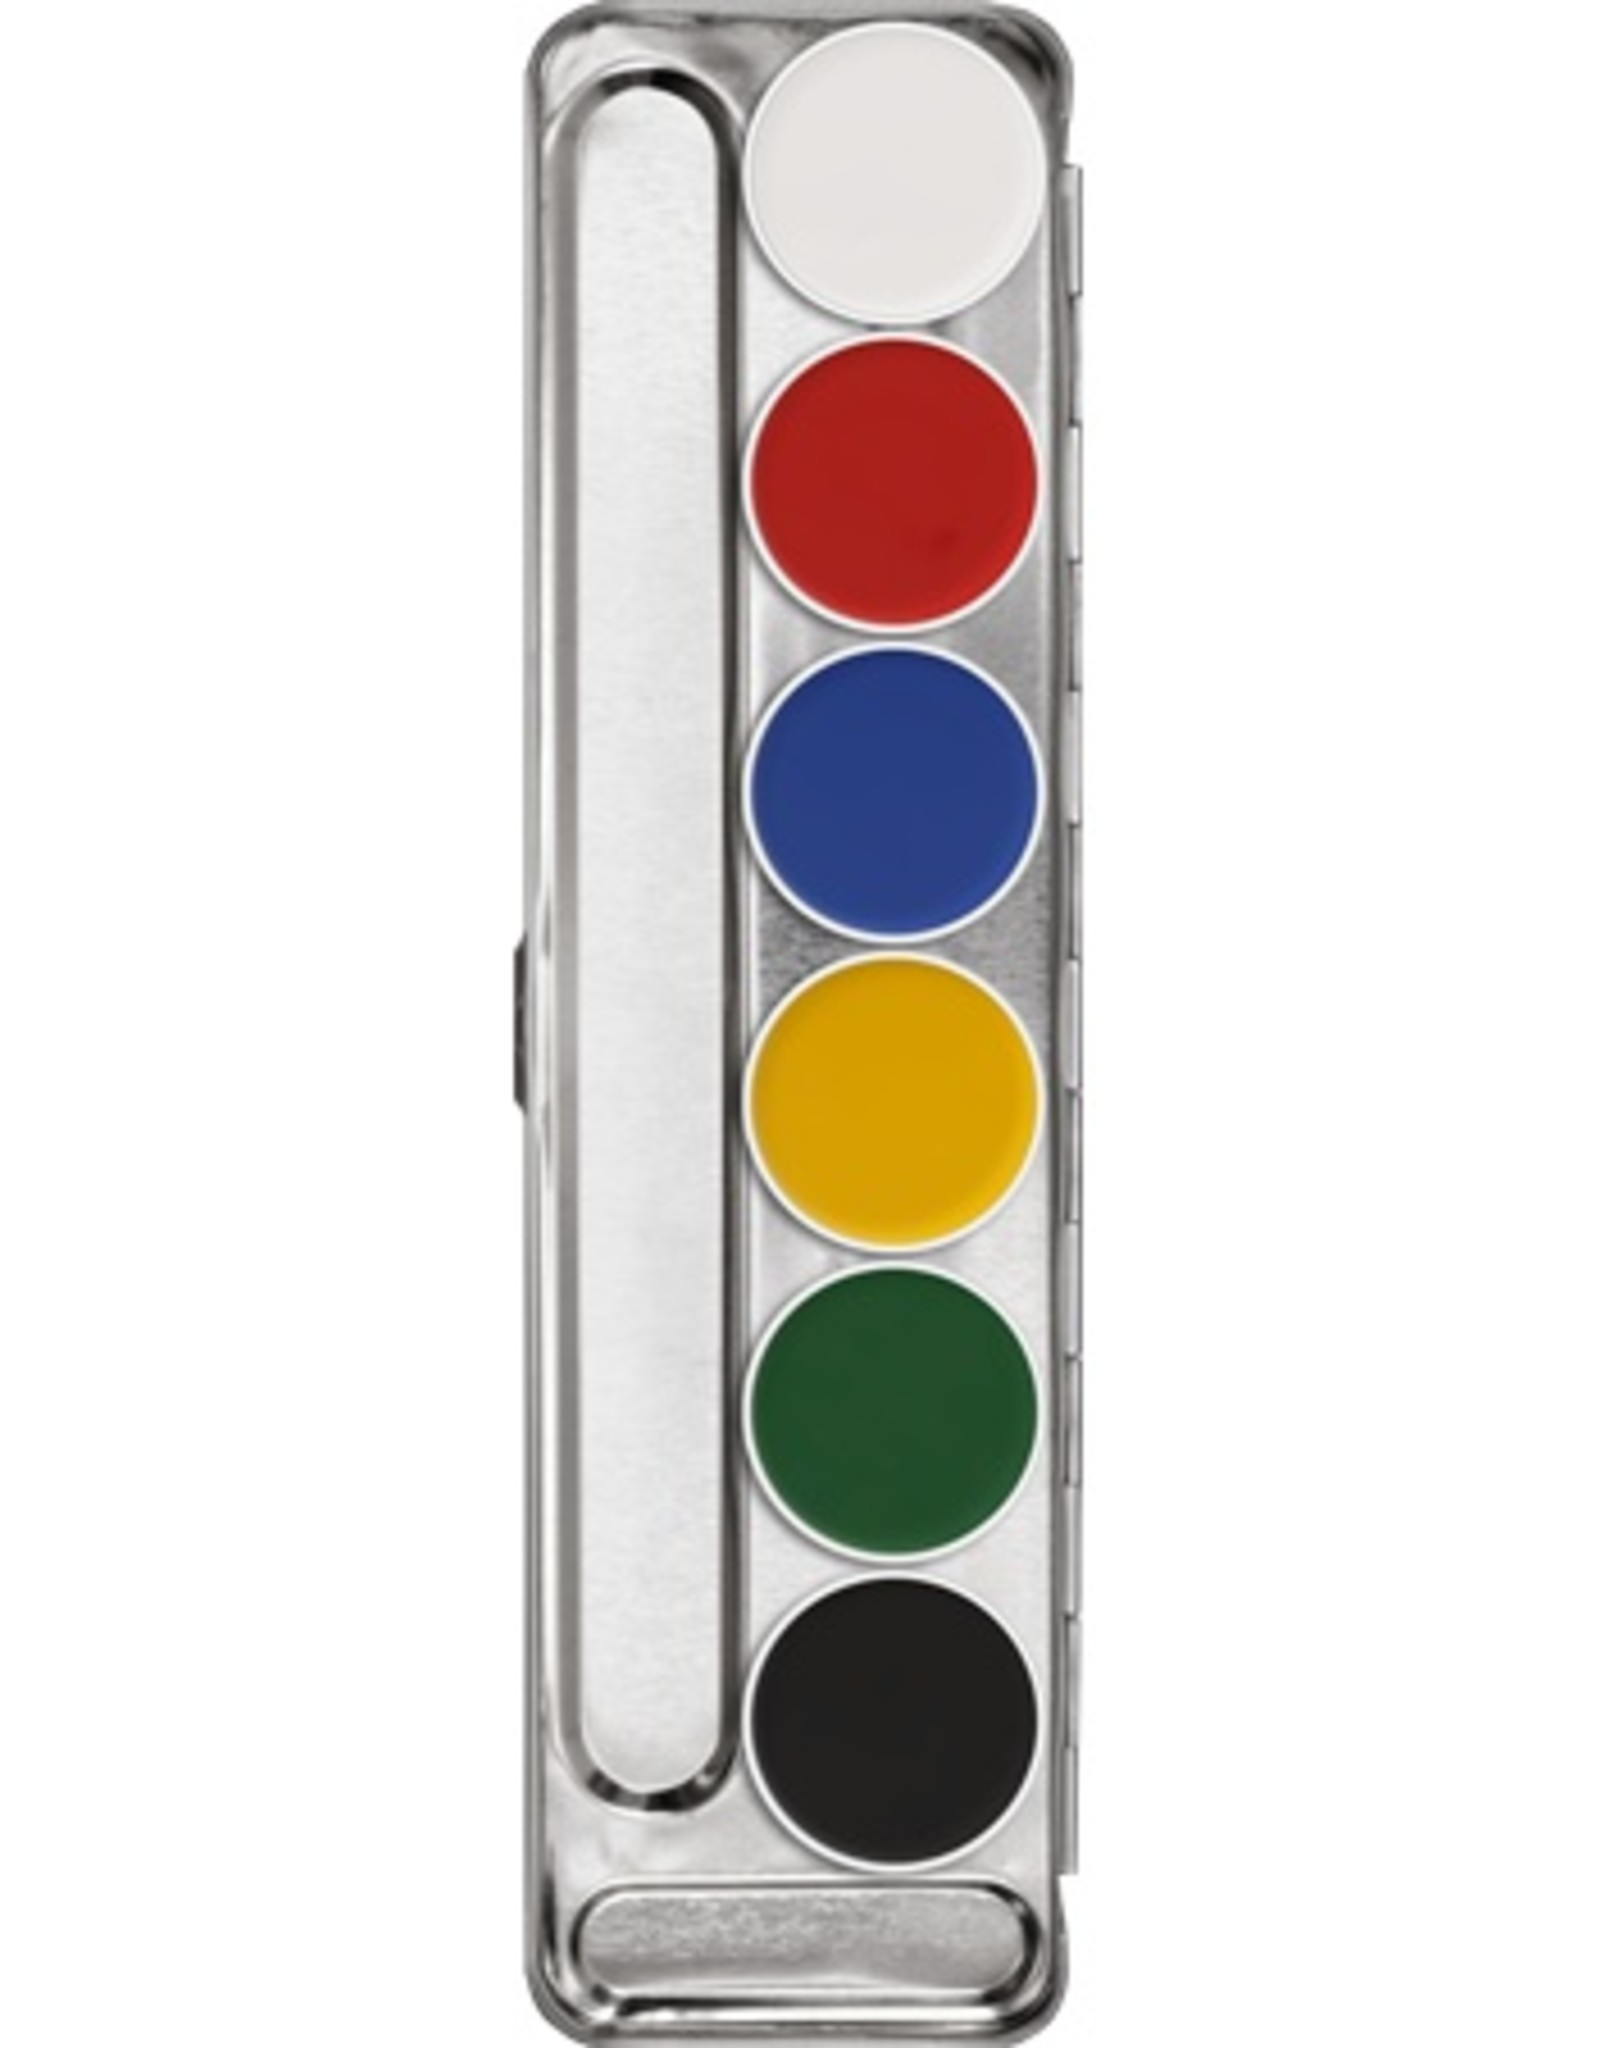 Kryolan Kryolan Aquacolor Palette - 6 Color A